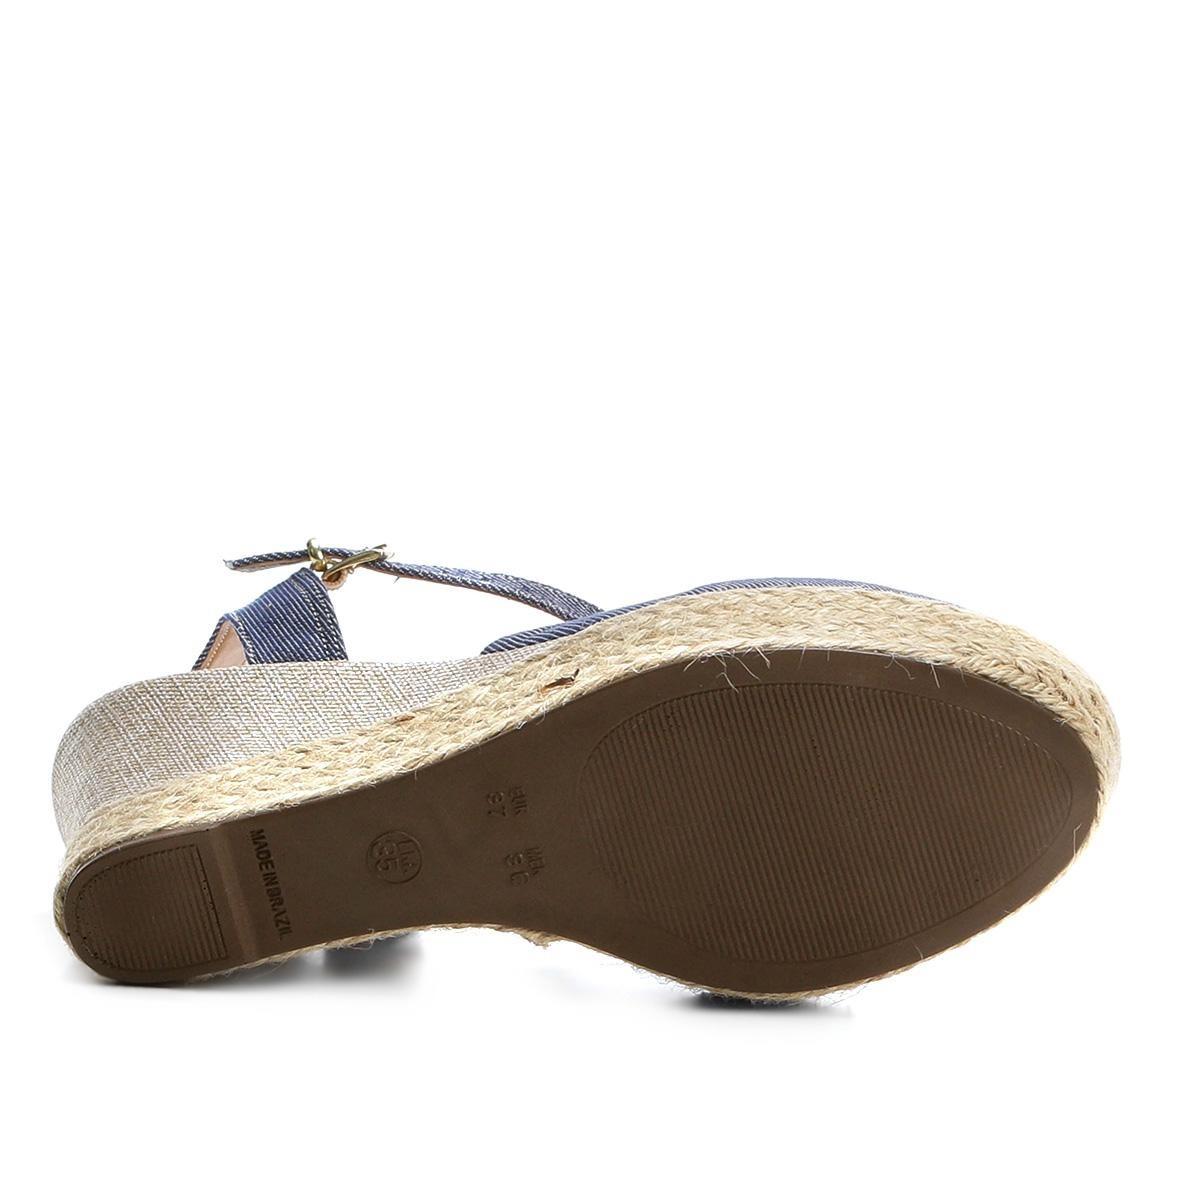 a9e11efa49 sandália anabela griffe espadrille jeans feminina. Carregando zoom.